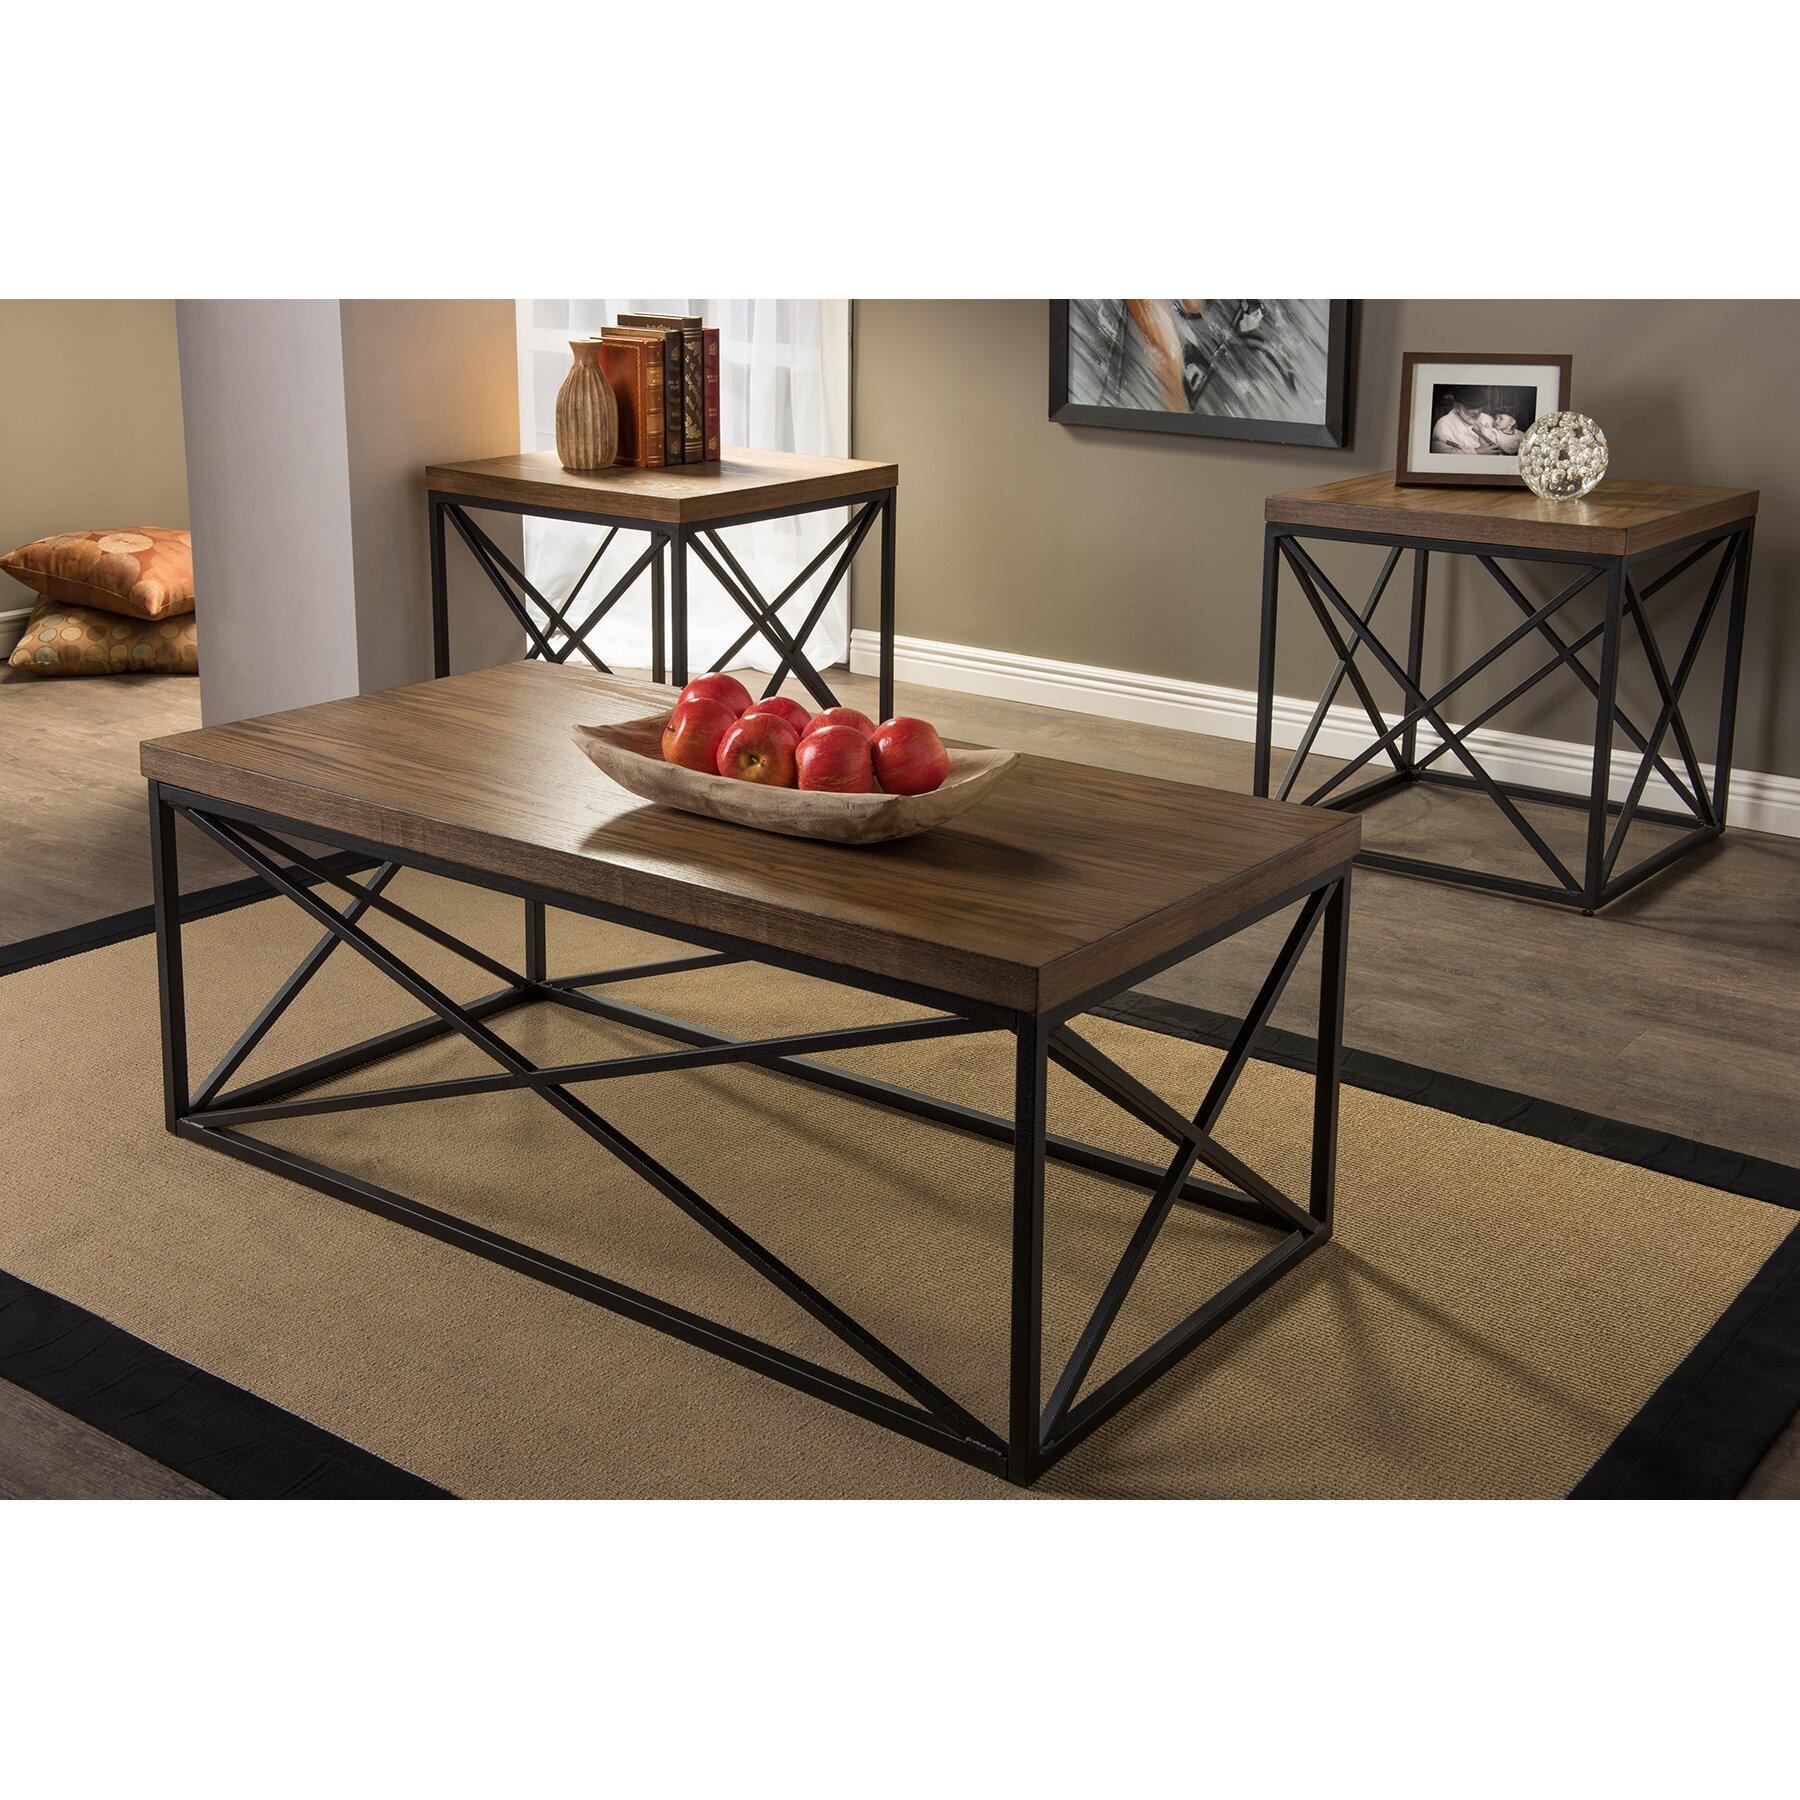 Wholesale interiors baxton studio 3 piece coffee table set for Baxton studio